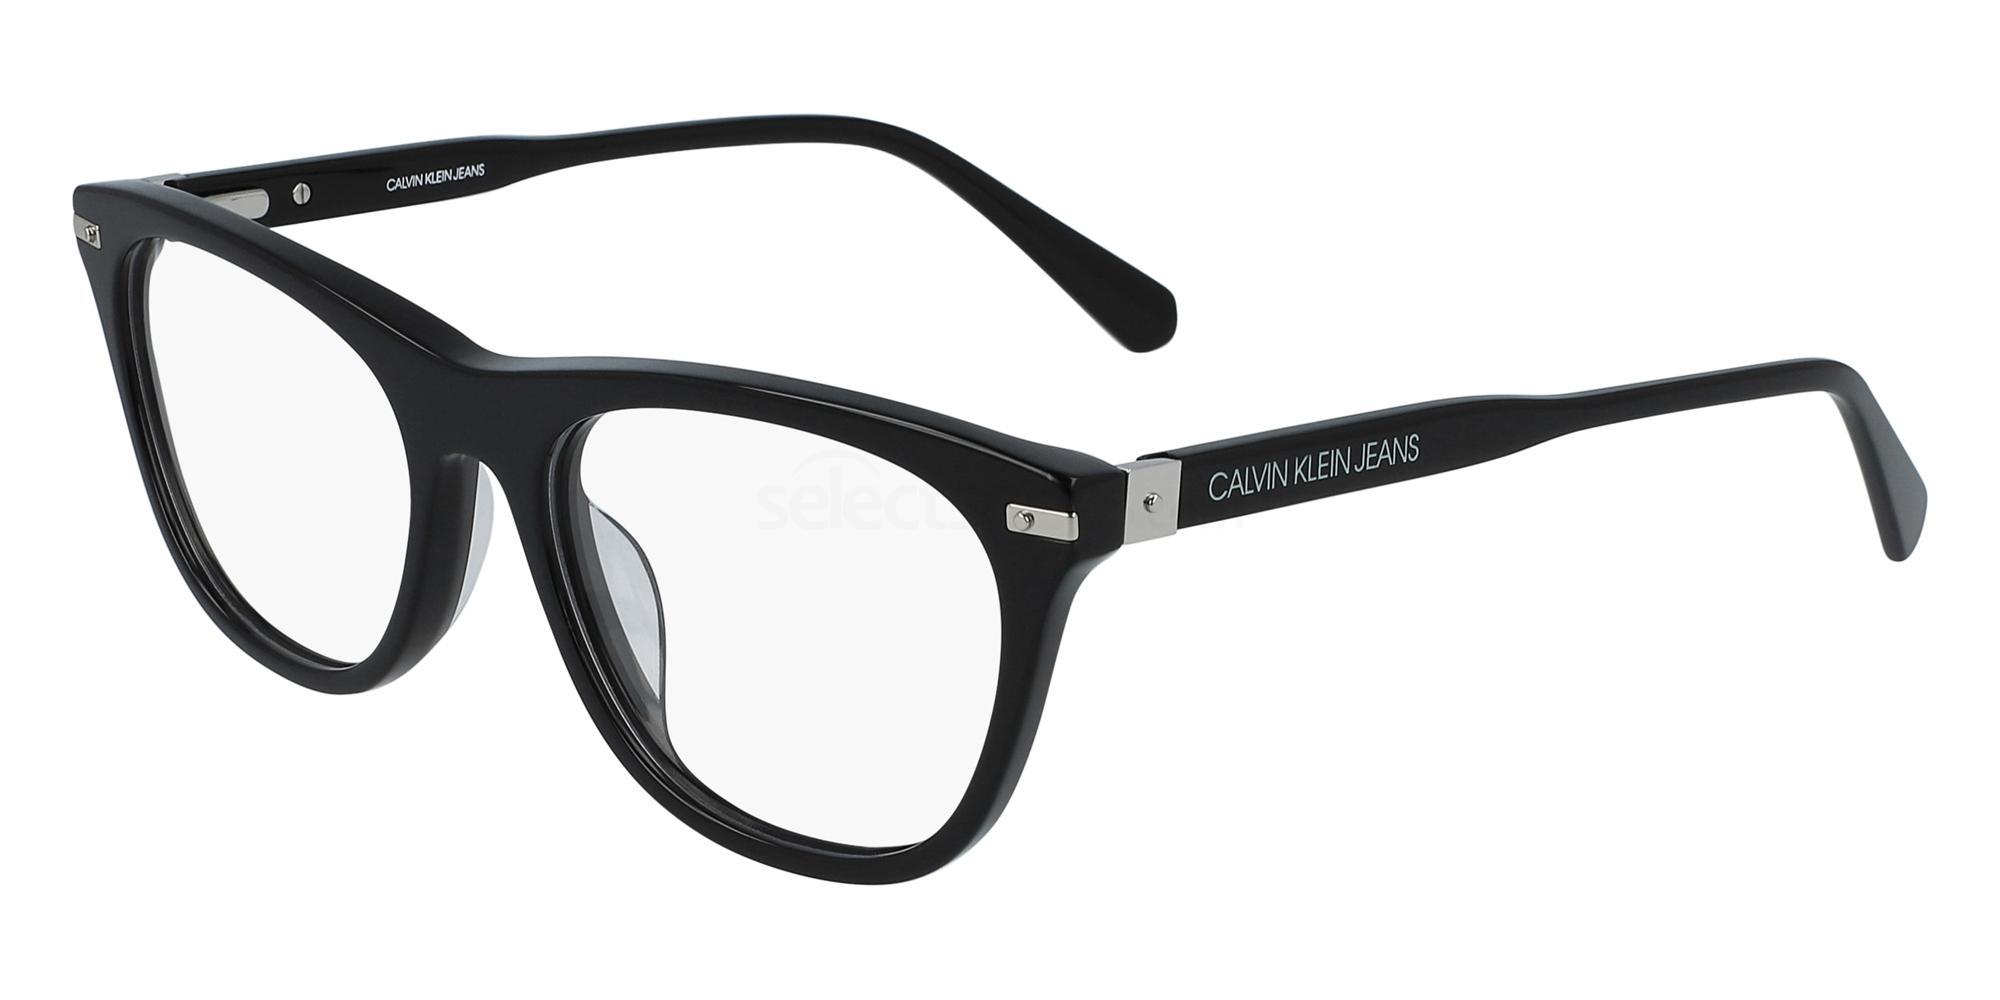 001 CKJ19525 Glasses, Calvin Klein Jeans